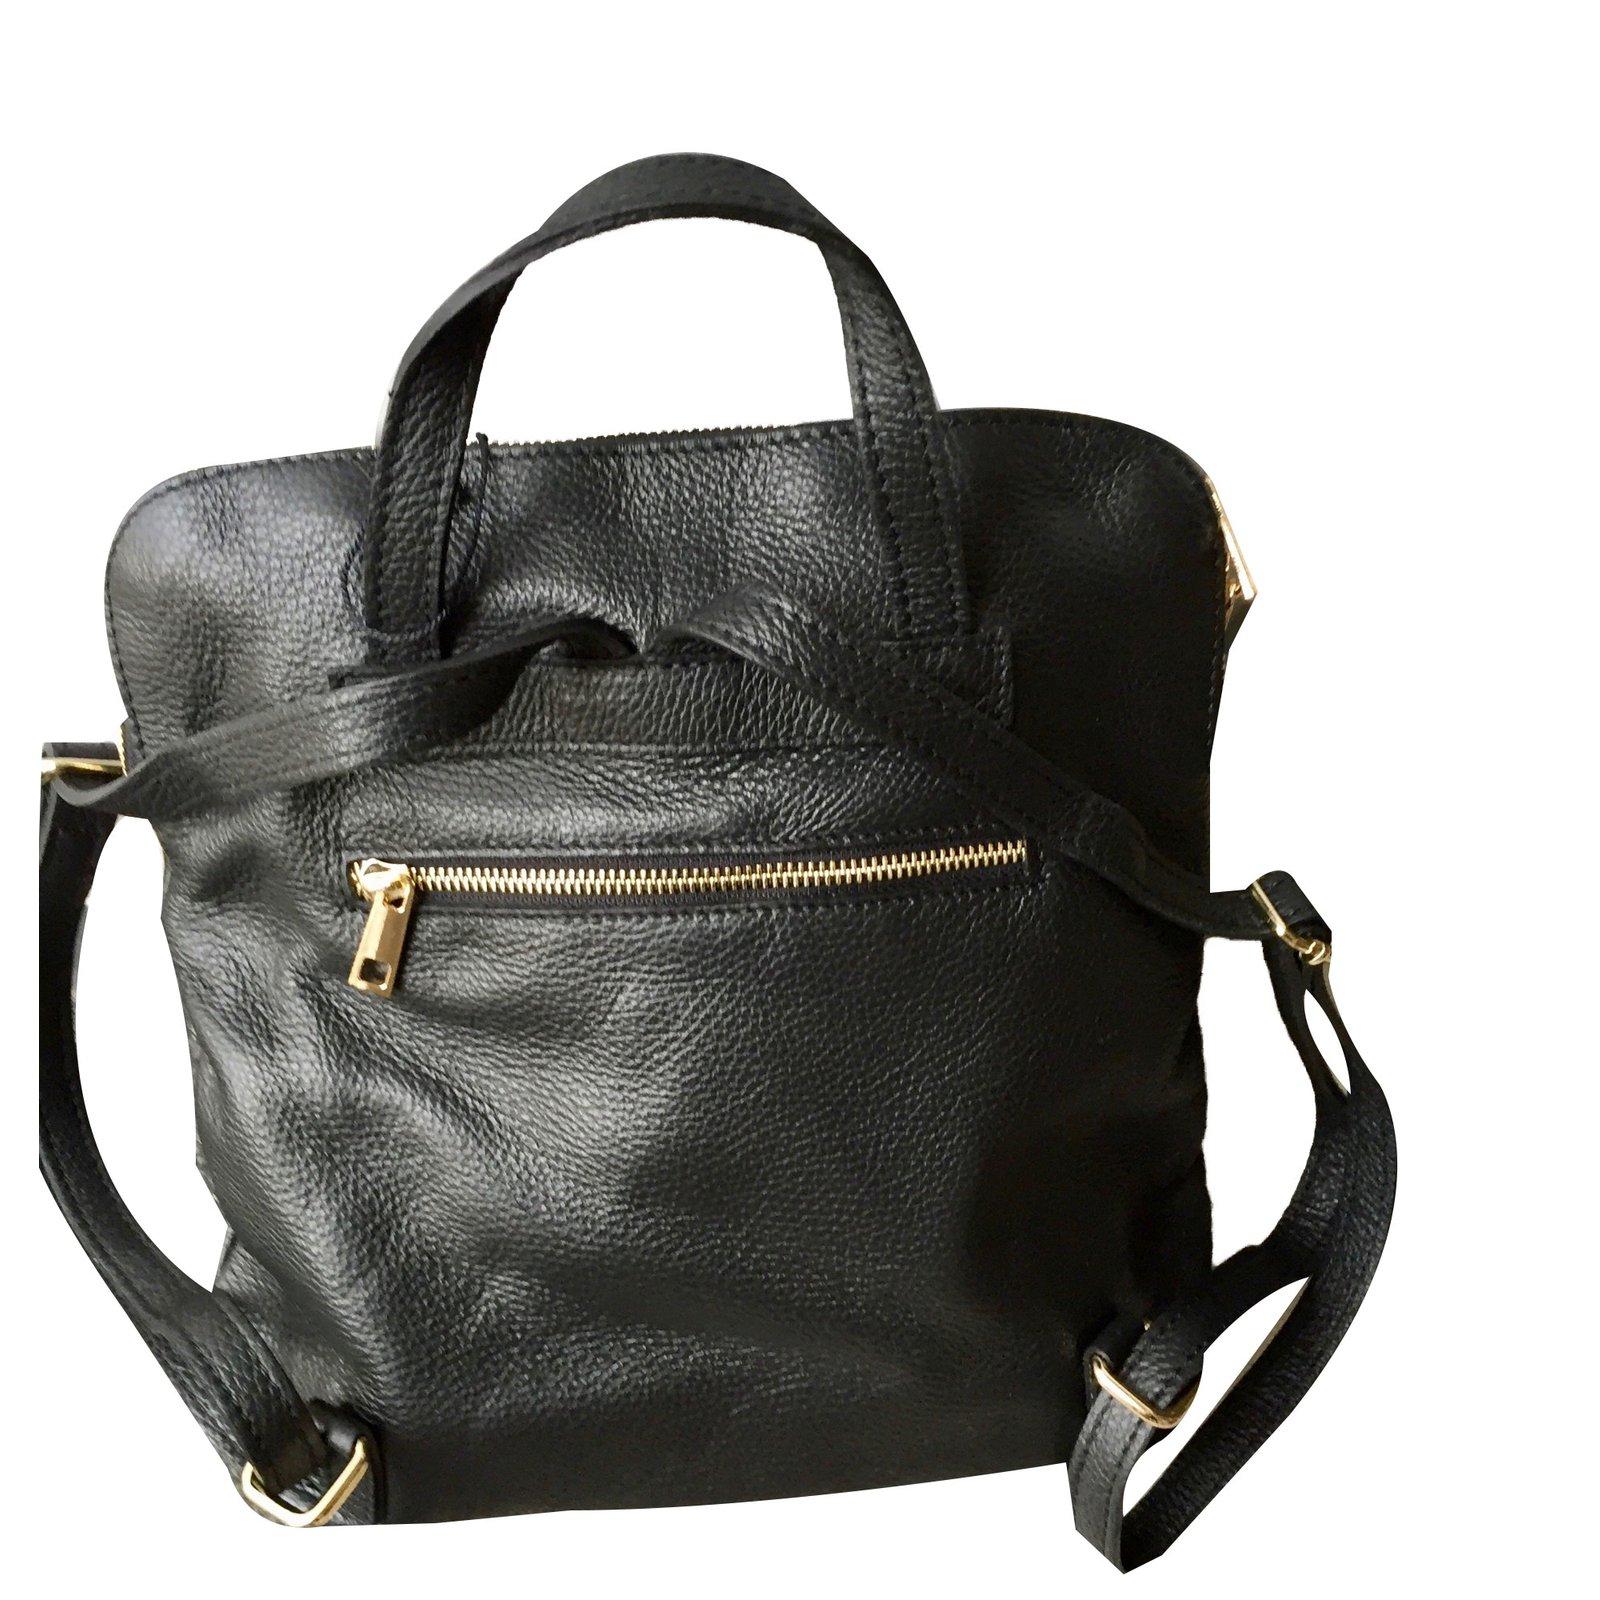 sacs dos autre marque sacs dos manoukian cuir noir joli closet. Black Bedroom Furniture Sets. Home Design Ideas